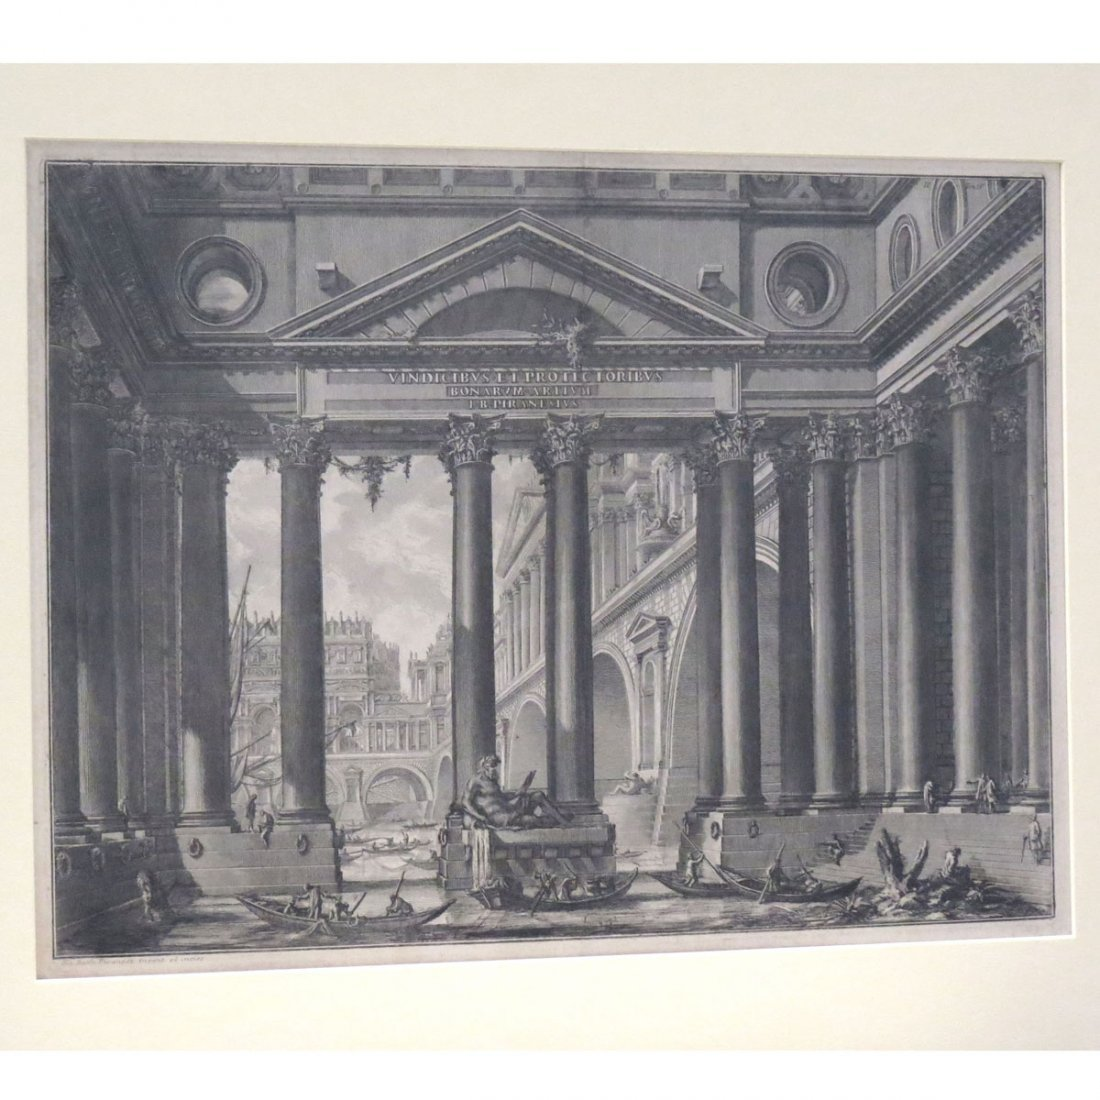 GIOVANNI PIRANESI (ITALY 1720-1778), ETCHING